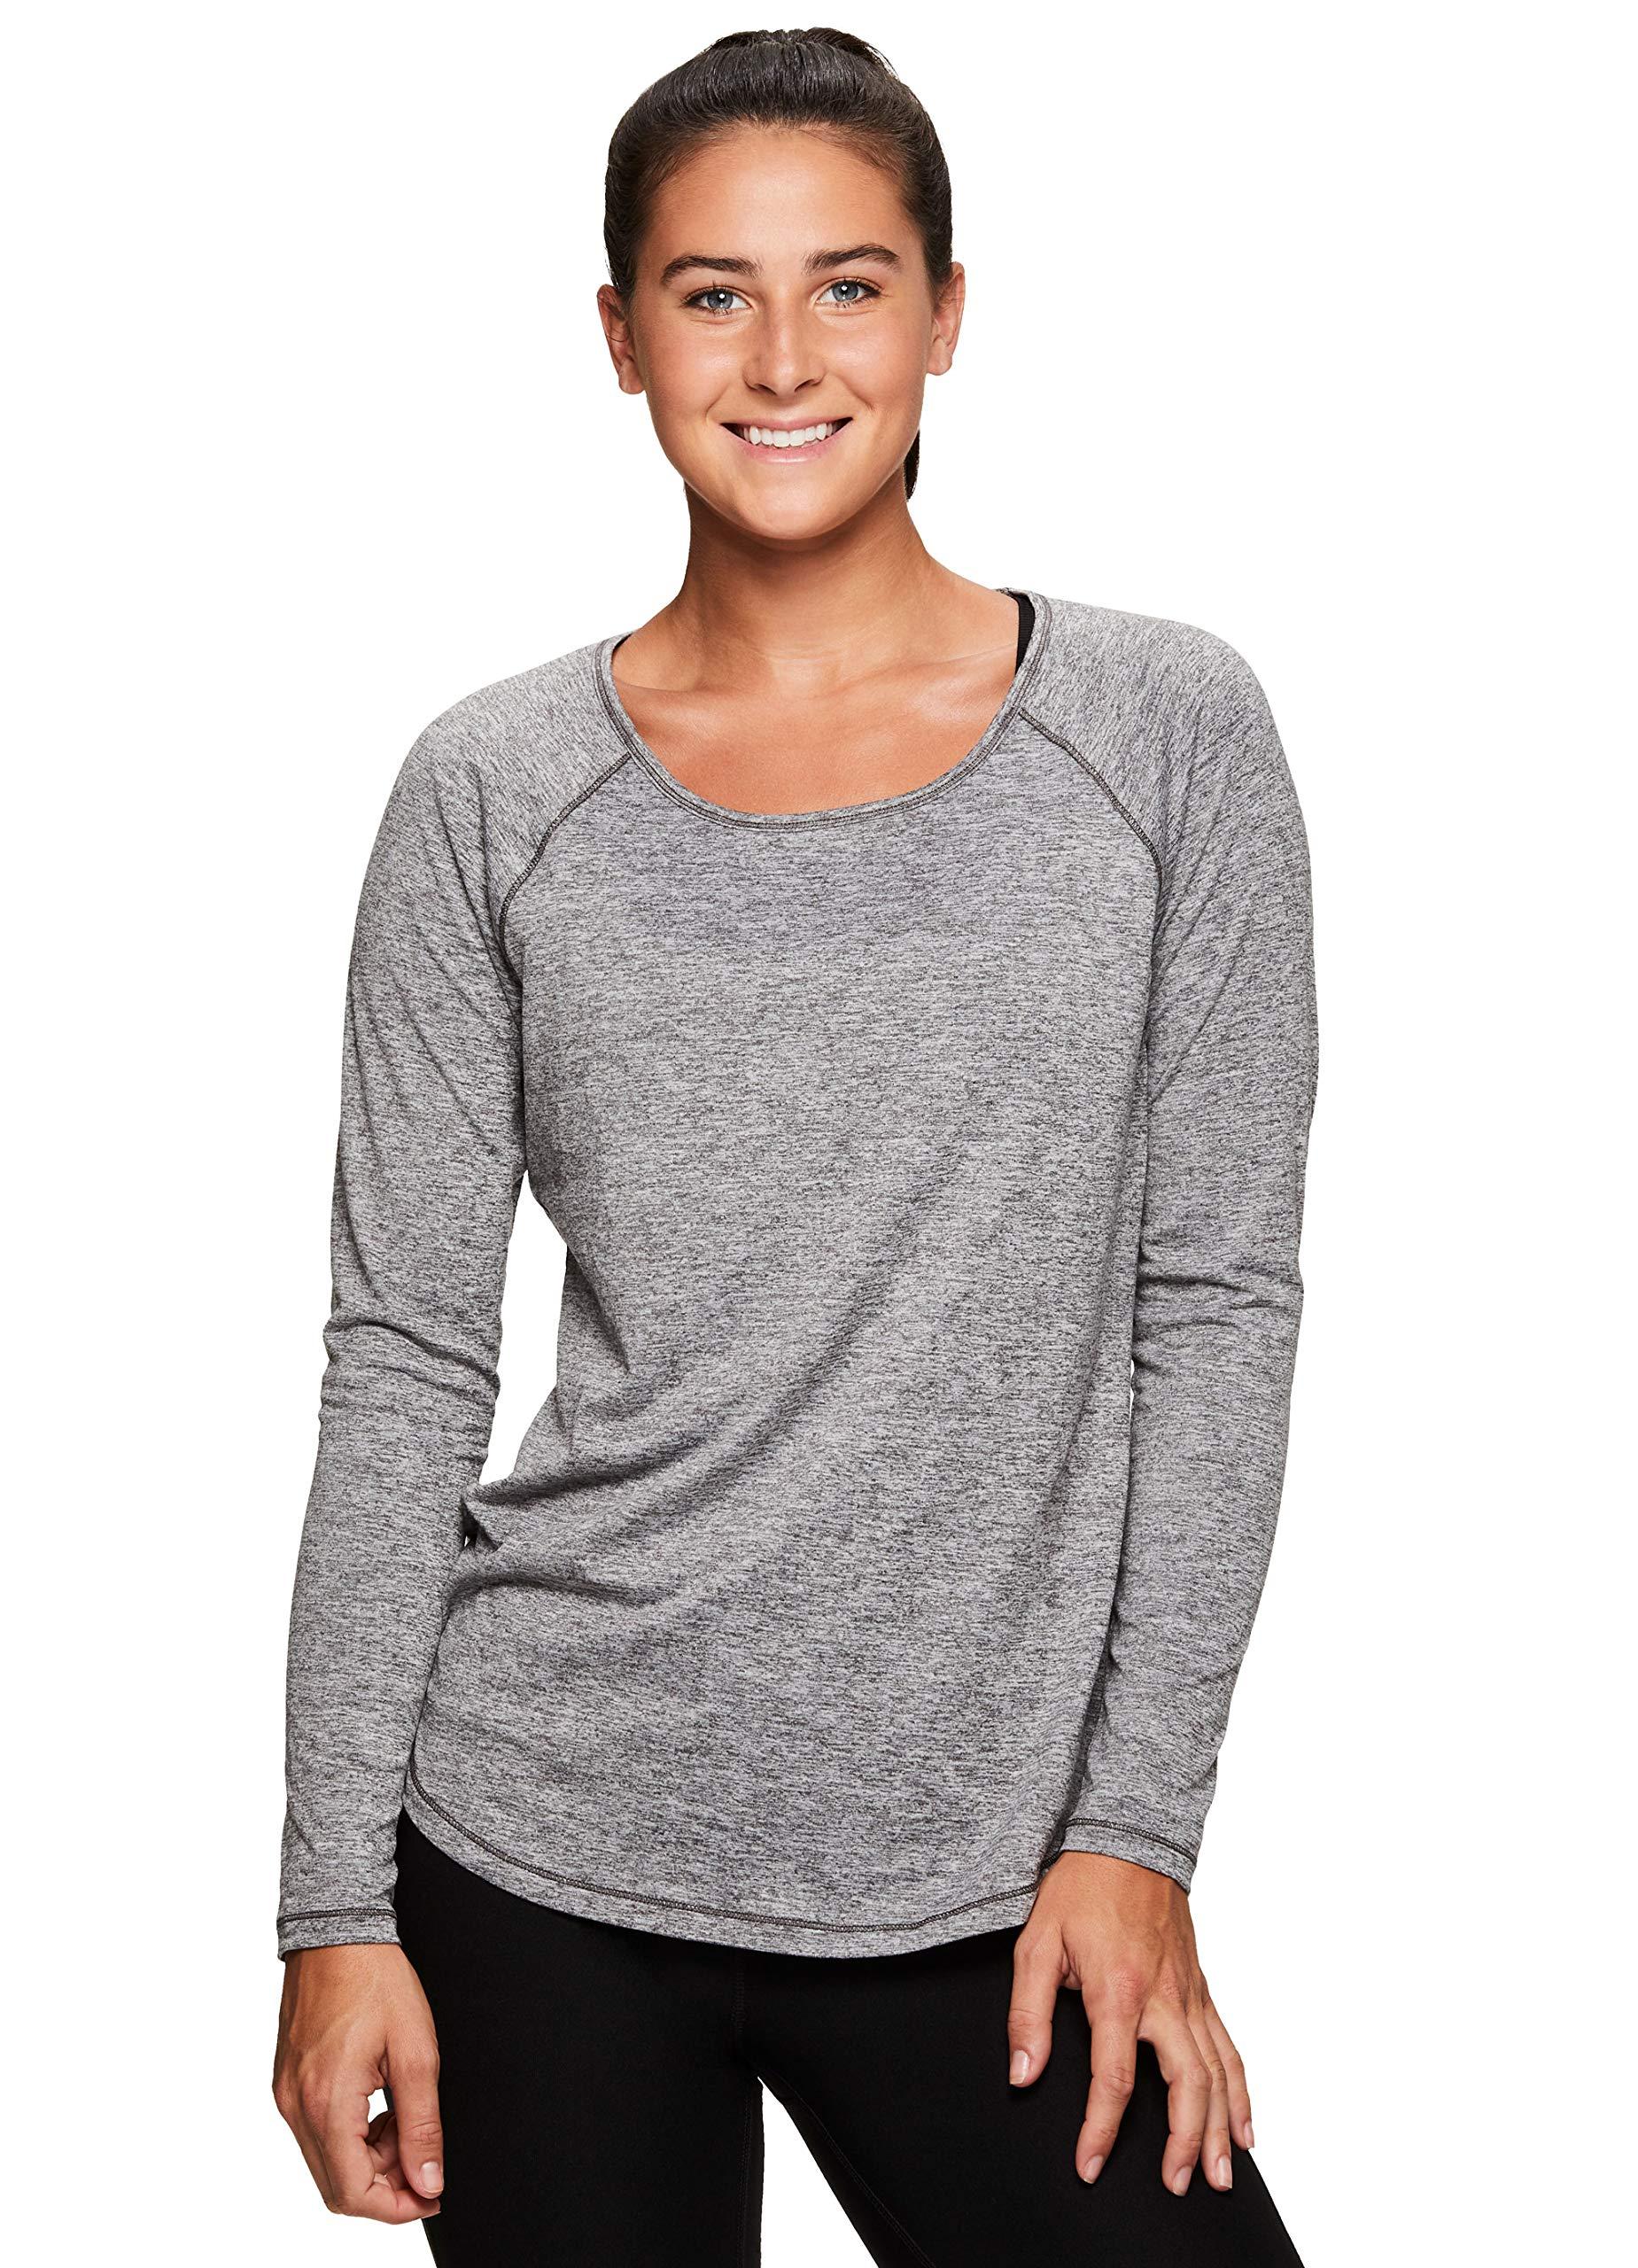 RBX Active Womens Fashion Athletic Yoga Long Sleeve Super Soft T-Shirt